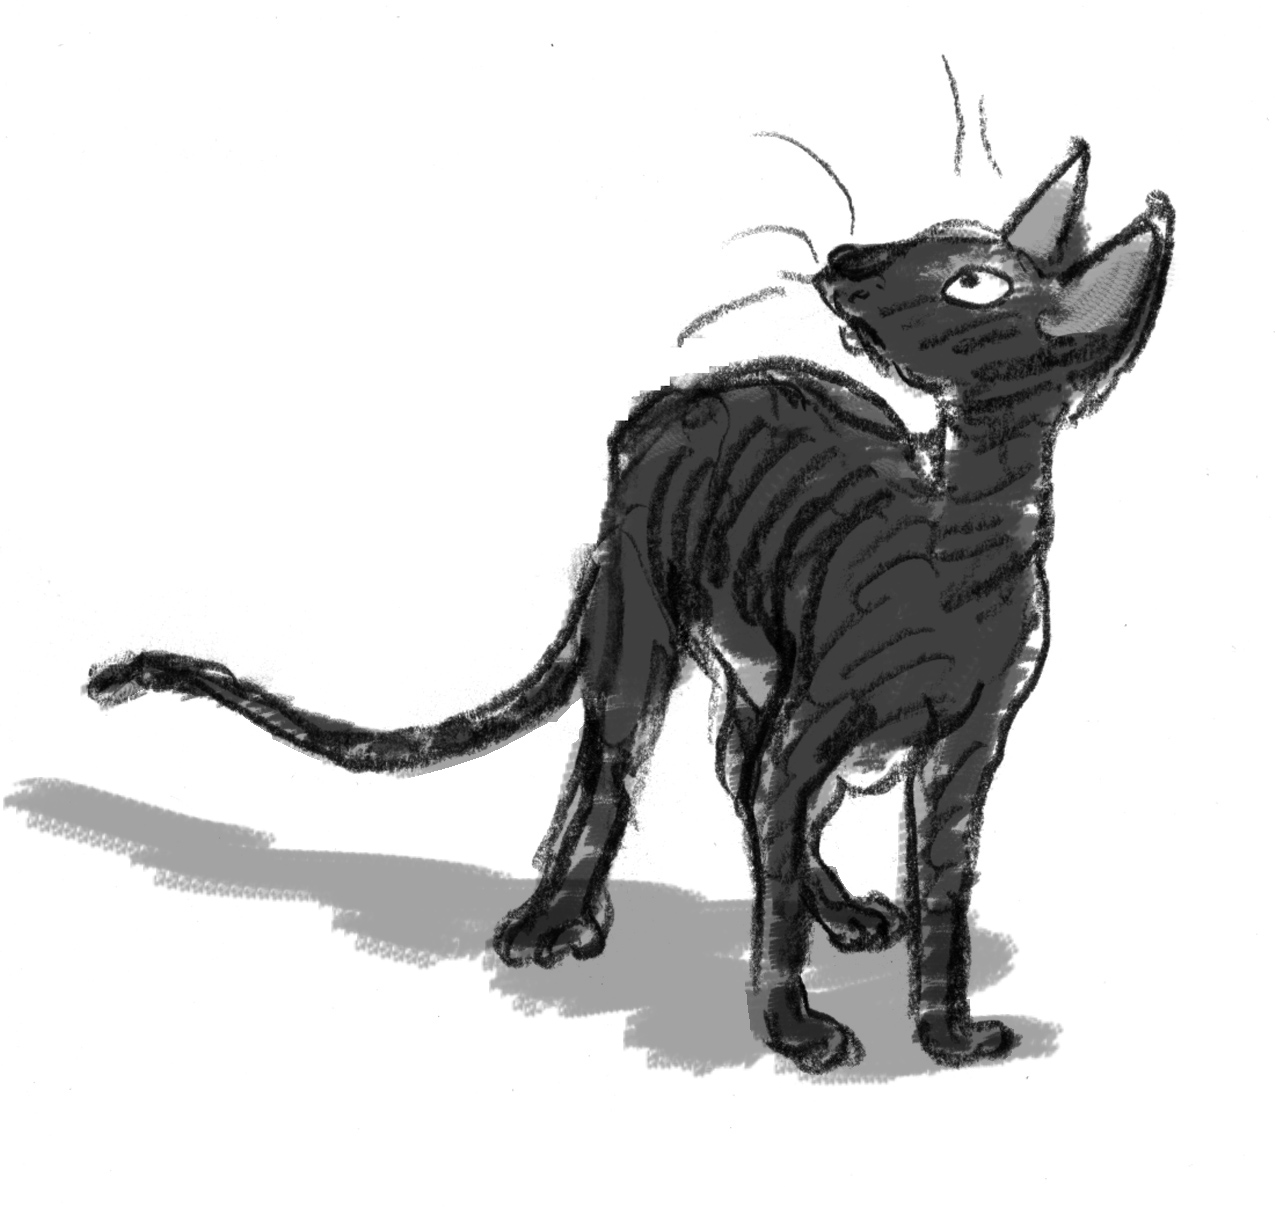 Cornish Rex character lores grey